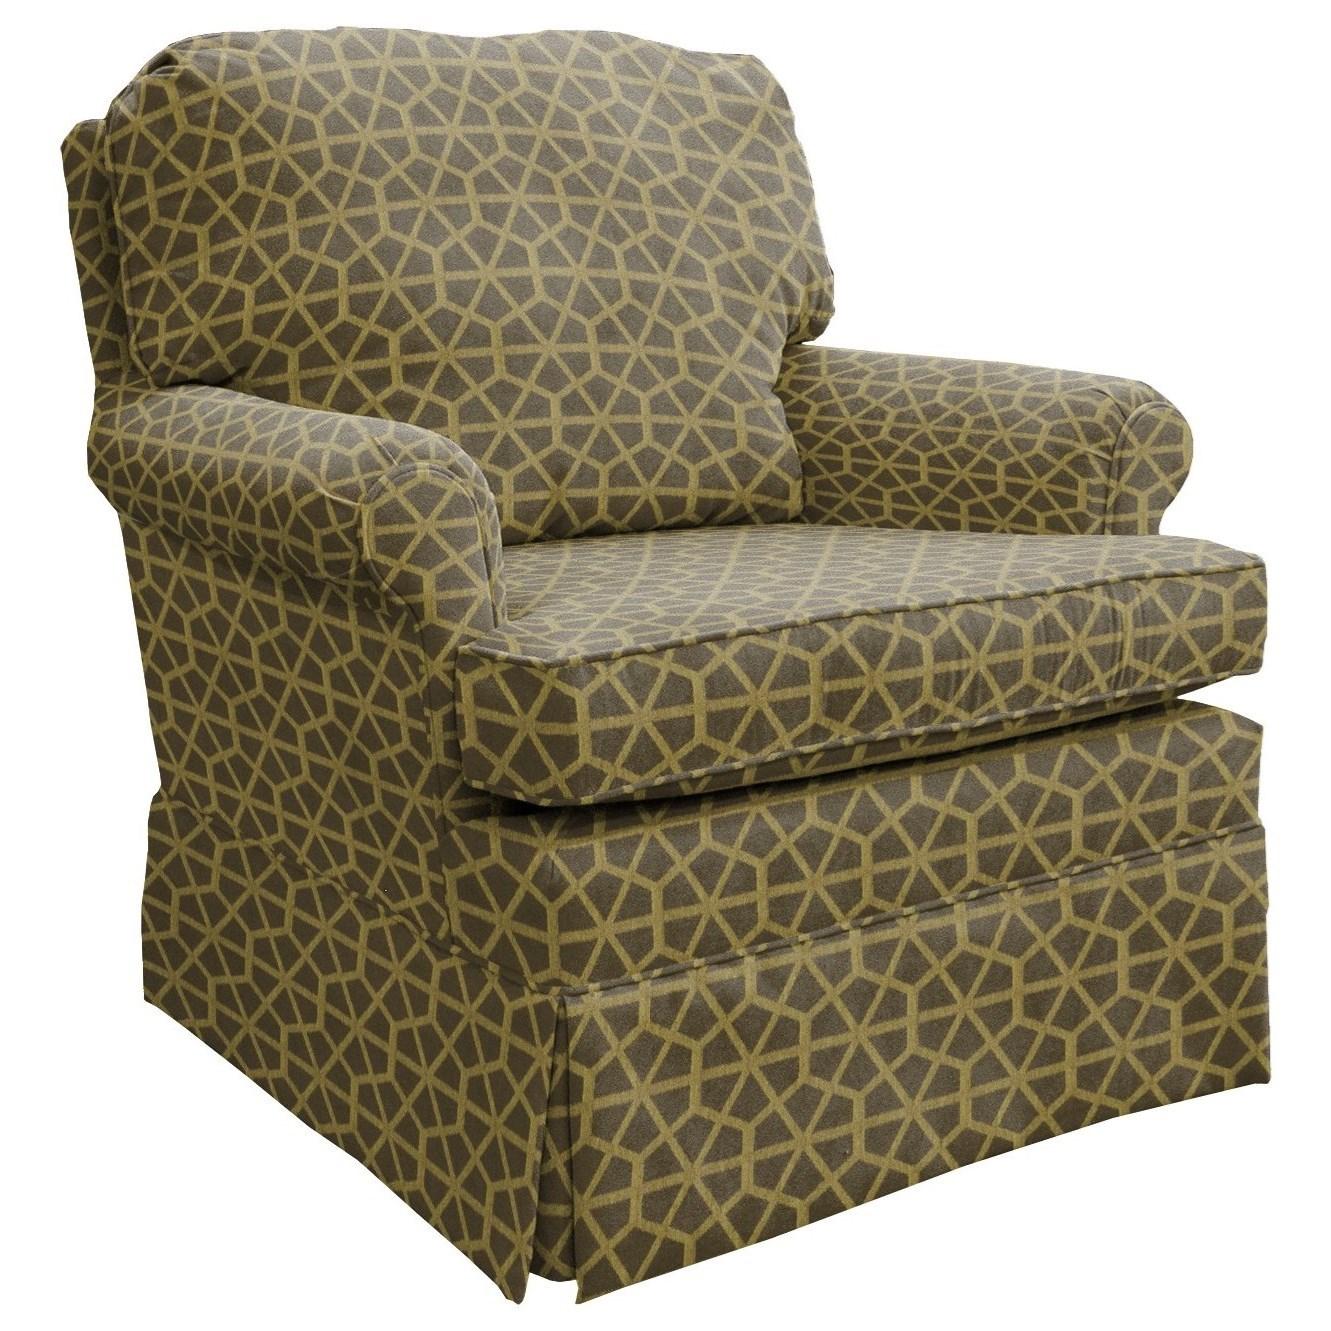 Best Home Furnishings Patoka Club Chair - Item Number: 2610-29095